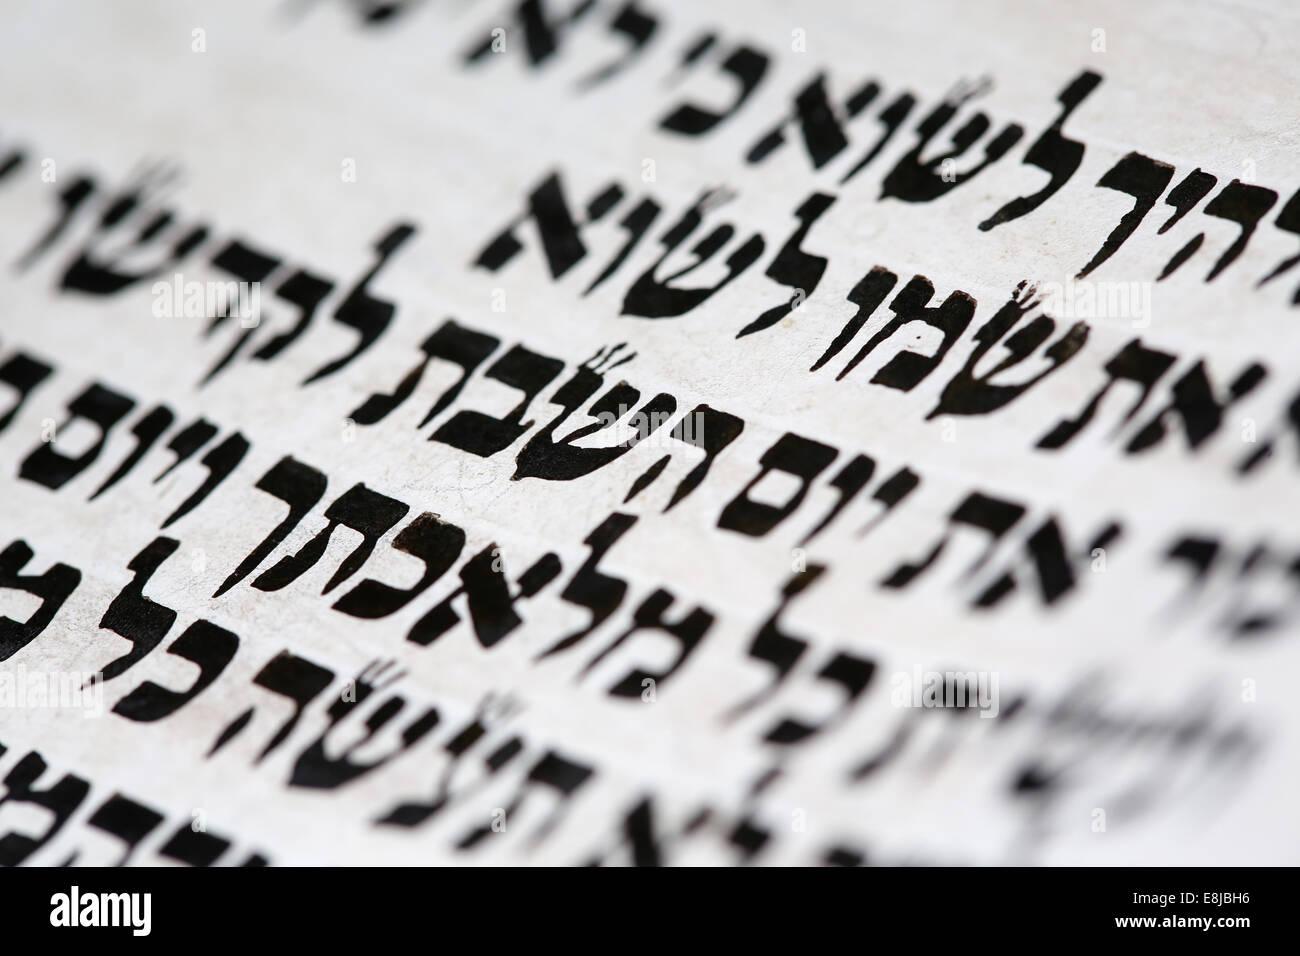 Jewish torah scroll. The word Shabbat in hebrew. - Stock Image